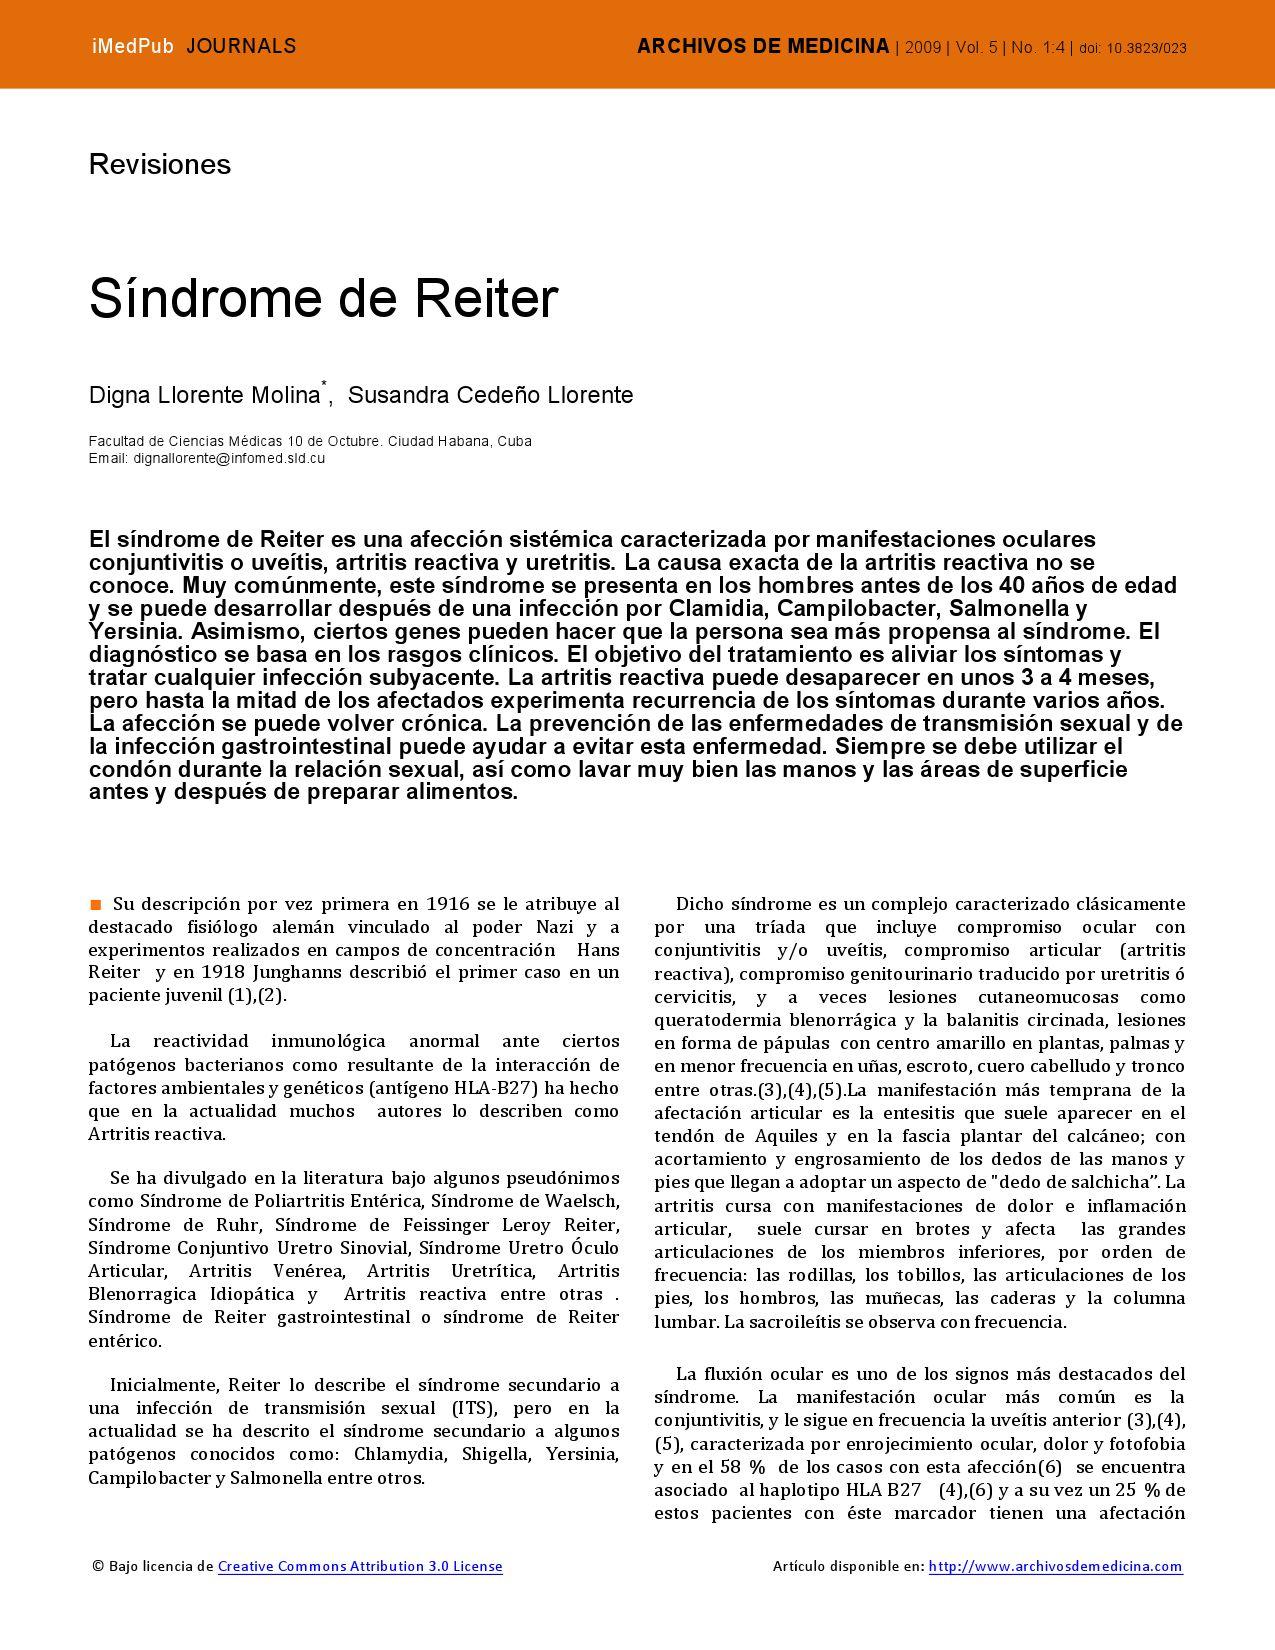 síndrome de uretritis reiter y